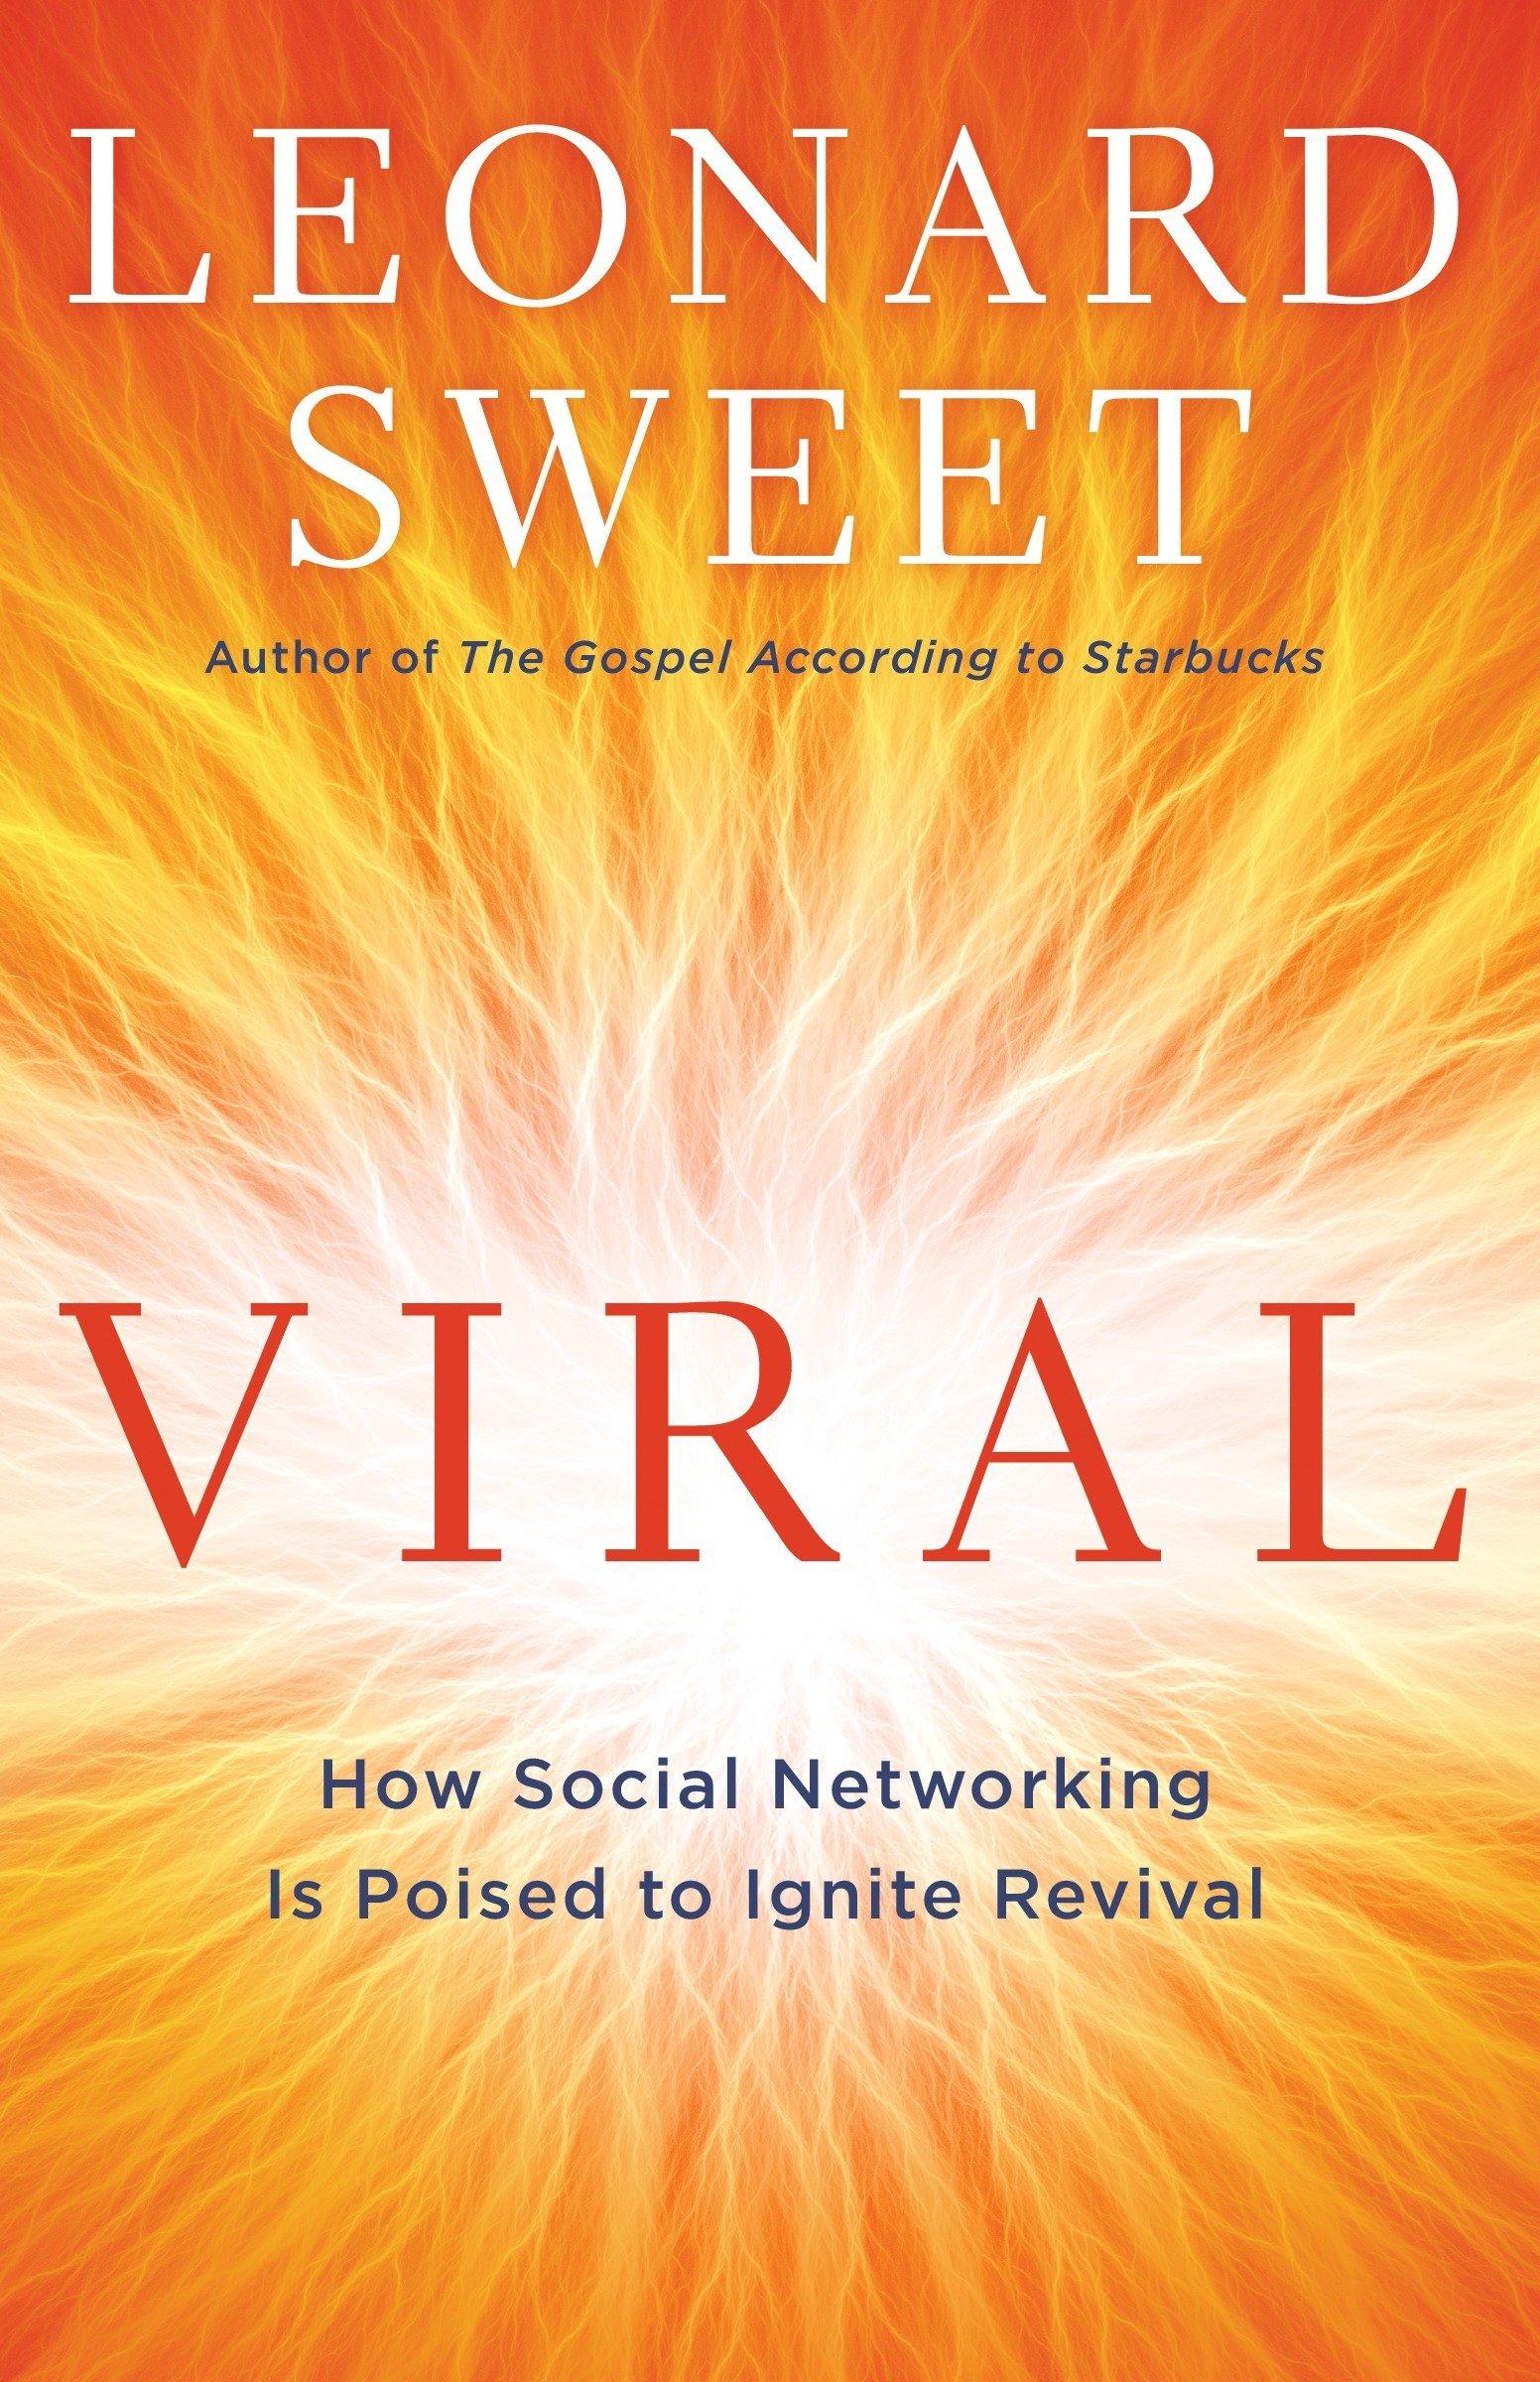 Viral: How Social Networking is Poised to Ignite Revival: Amazon.es: Leonard Sweet: Libros en idiomas extranjeros